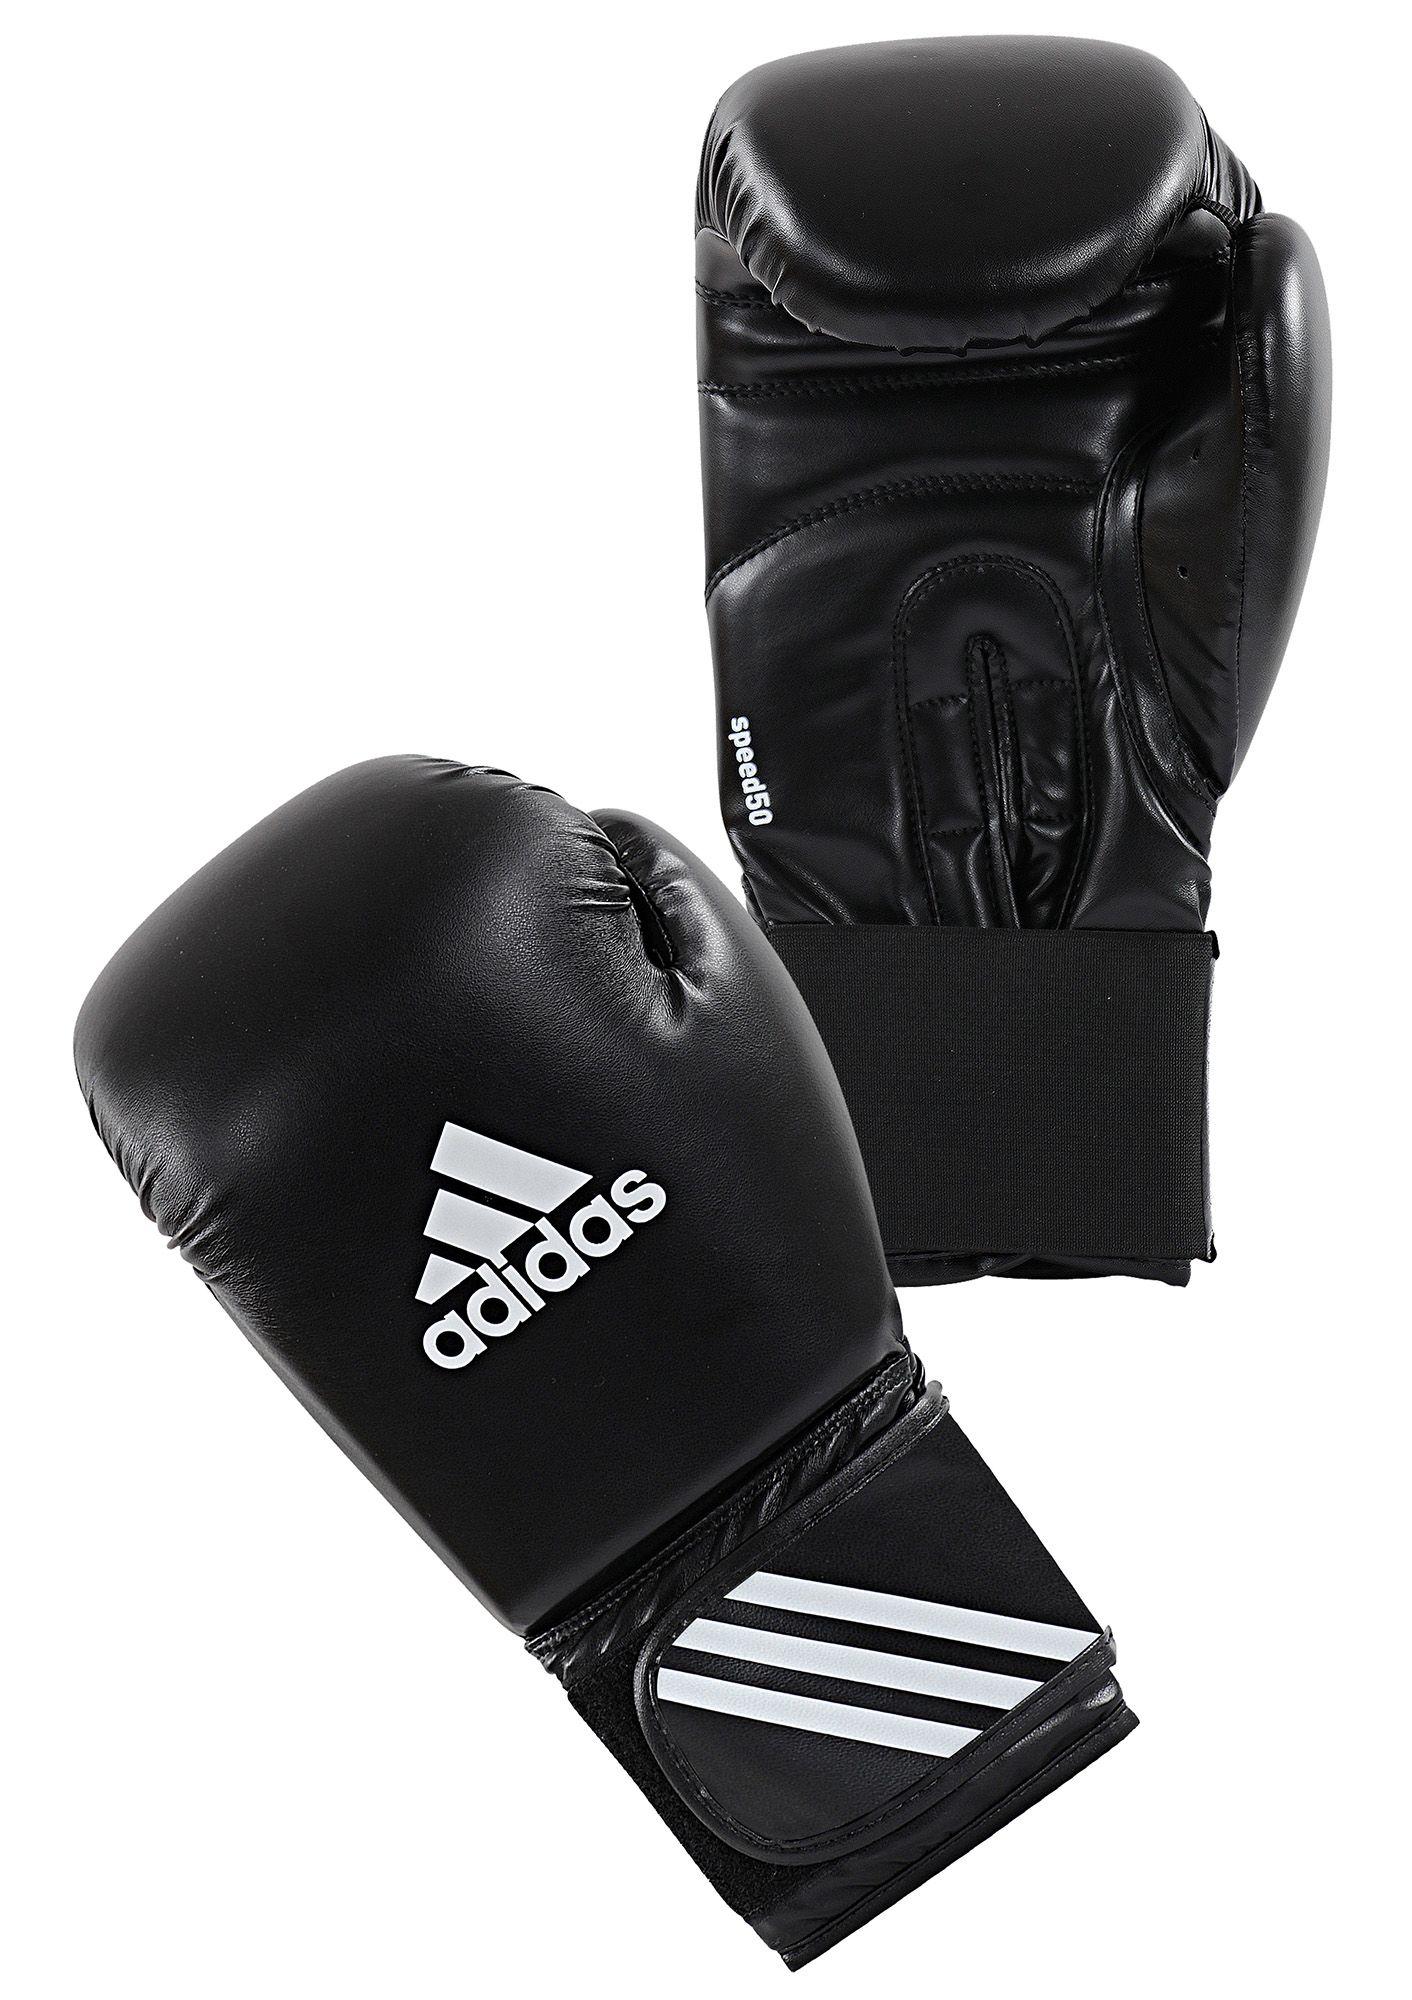 ADIDAS PERFORMANCE adidas Performance Boxhandschuhe, »Speed 50«